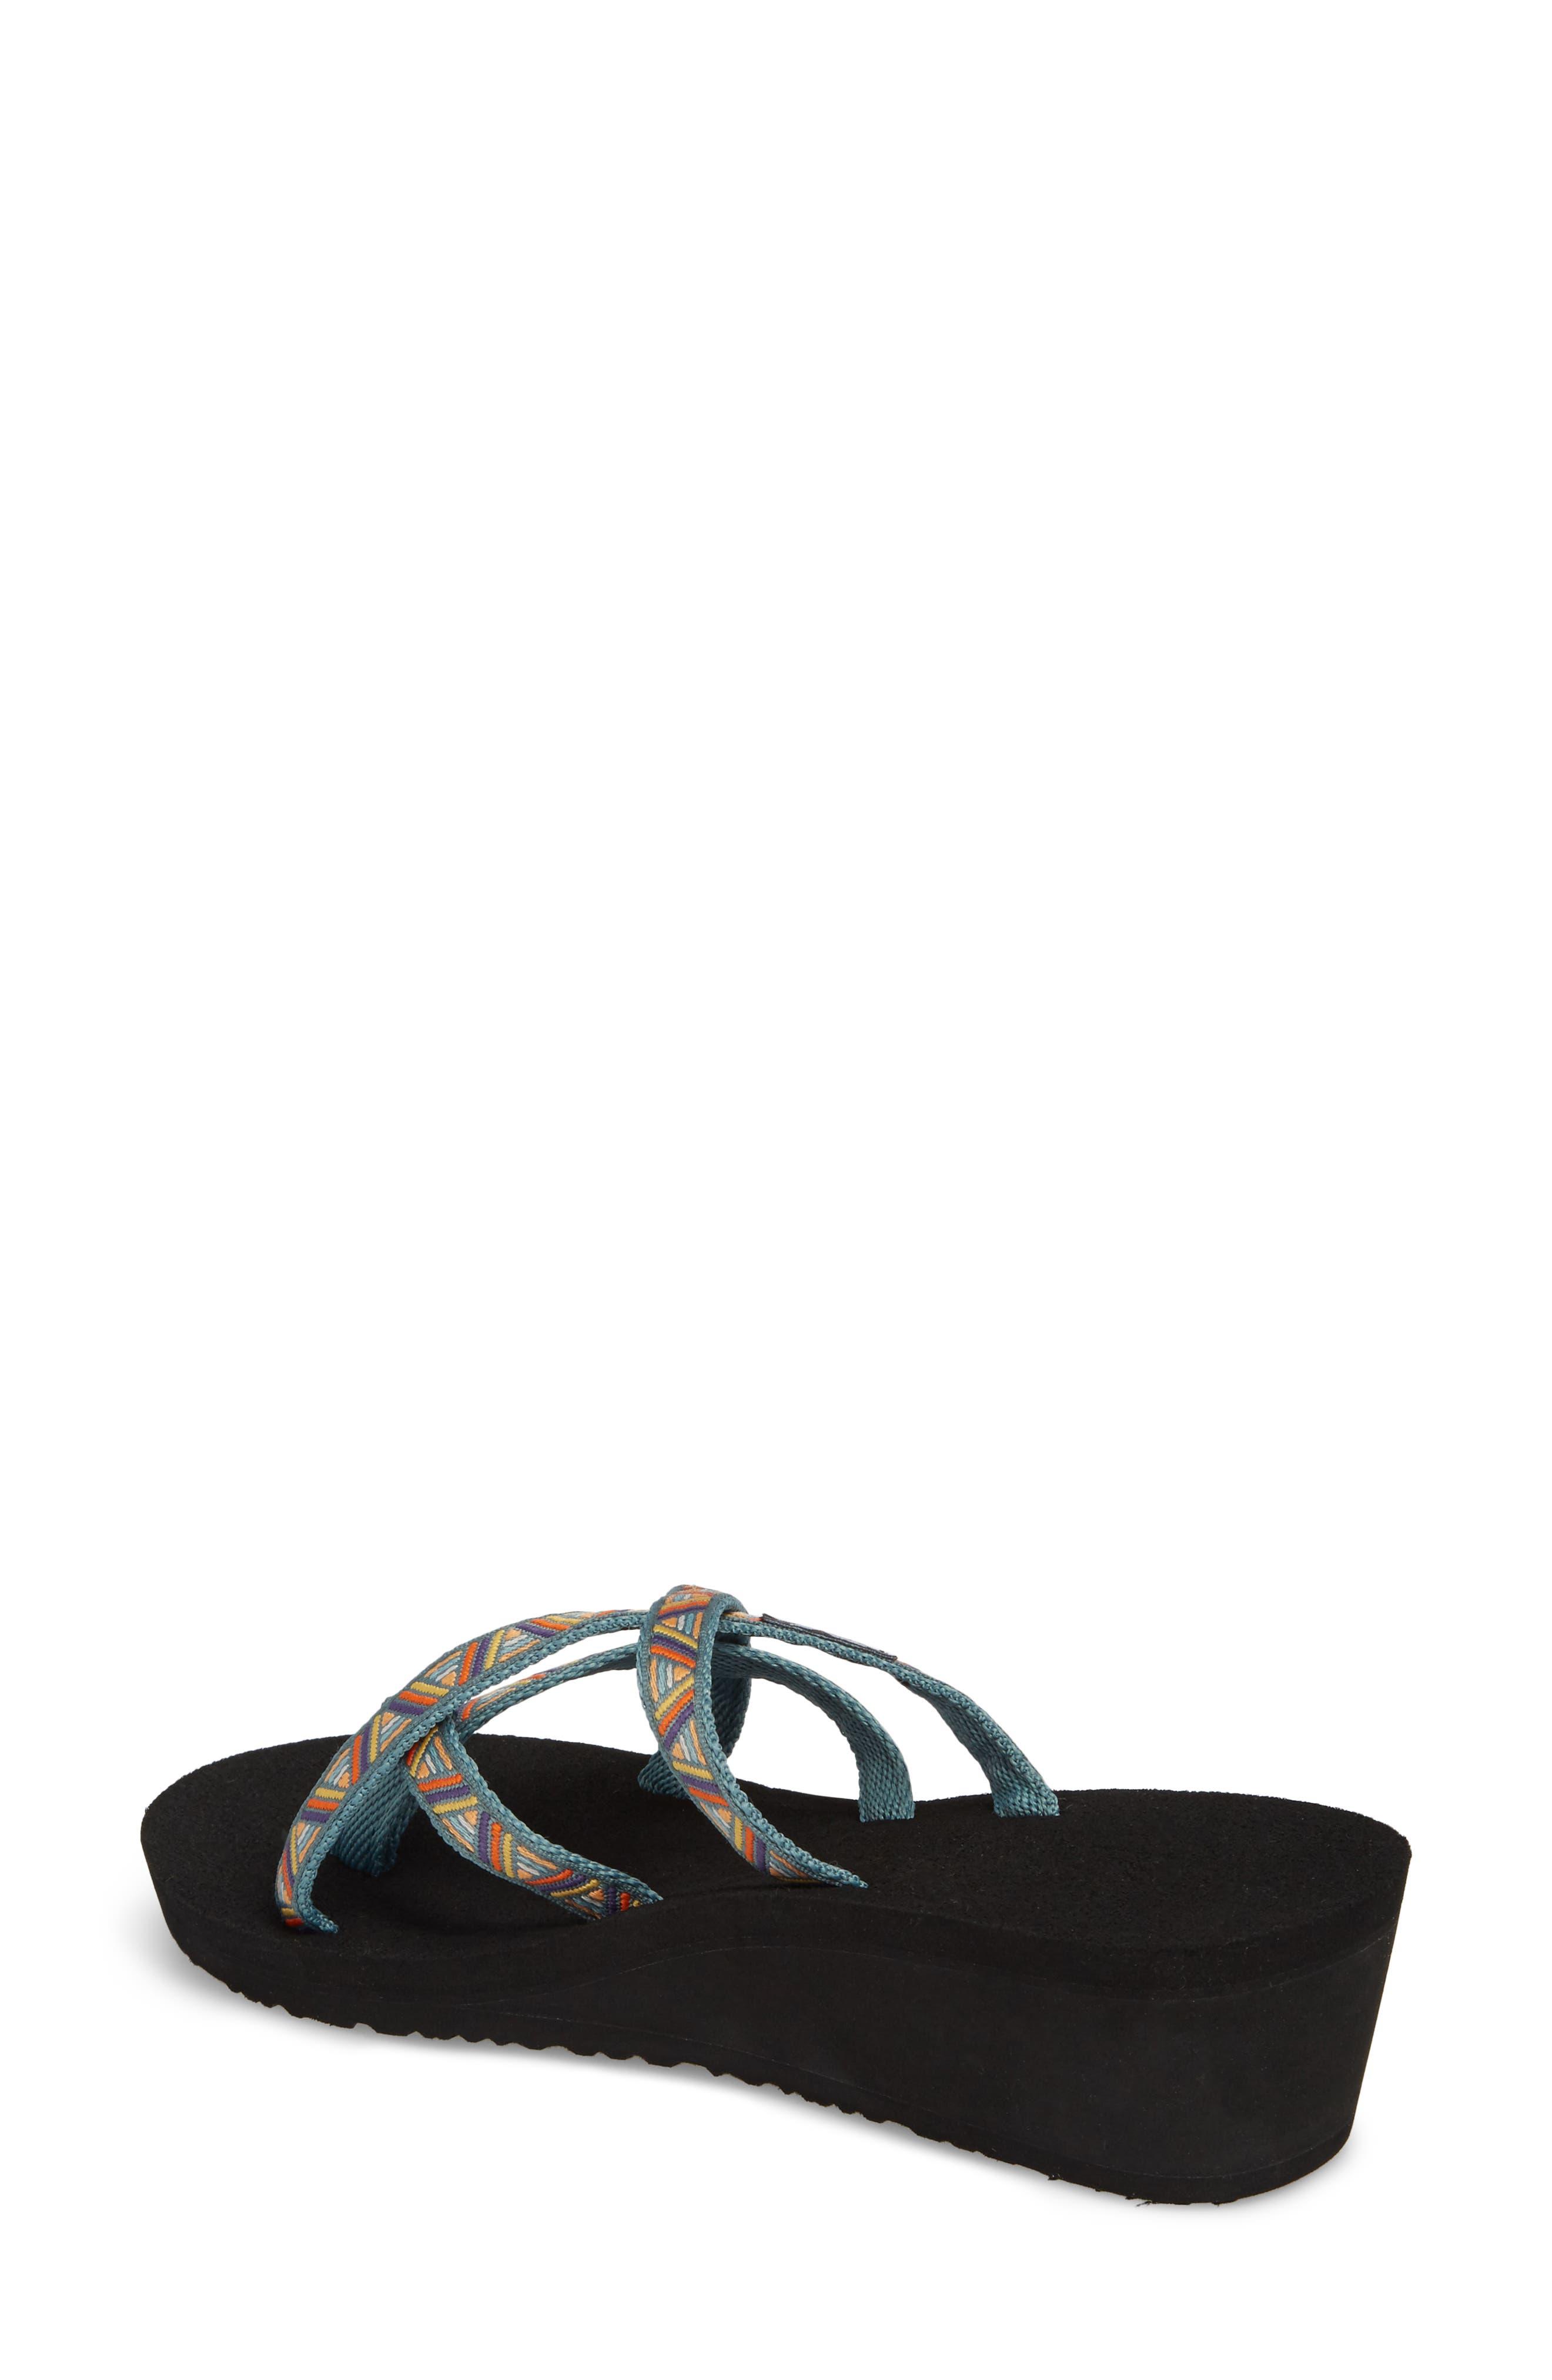 'Mandalyn' Wedge Sandal,                             Alternate thumbnail 2, color,                             930